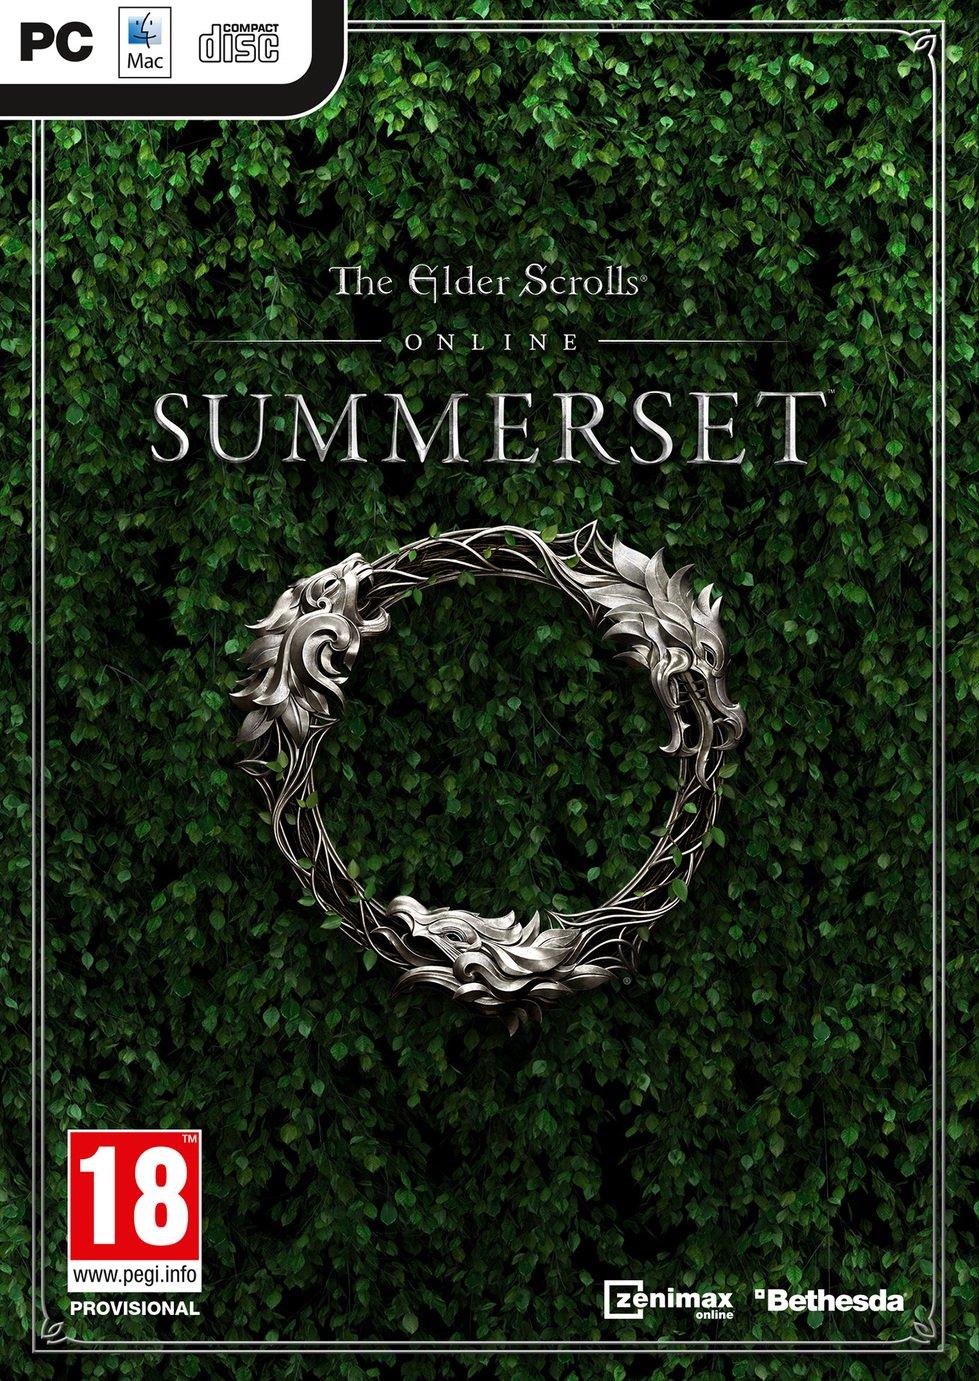 Image of Elder Scrolls Online: Summerset PC Pre-Order Game